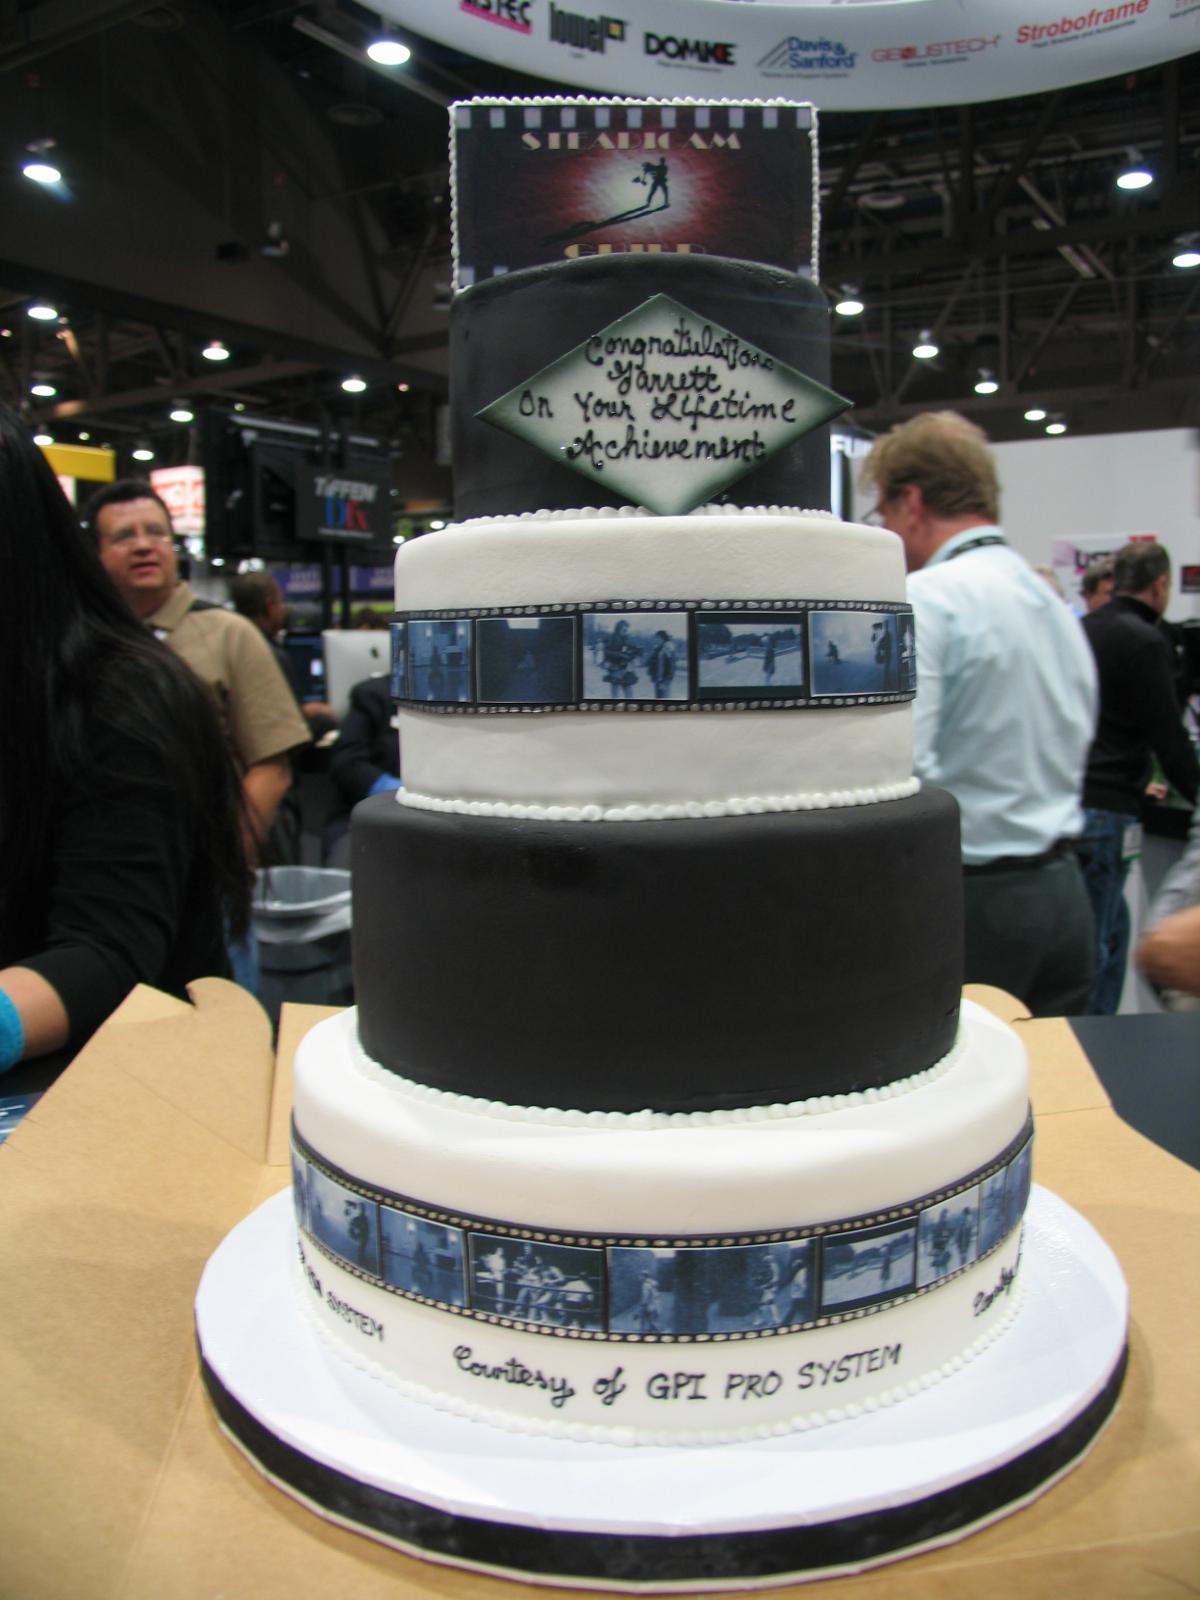 SGLAA_Cake_from_PRO.JPG